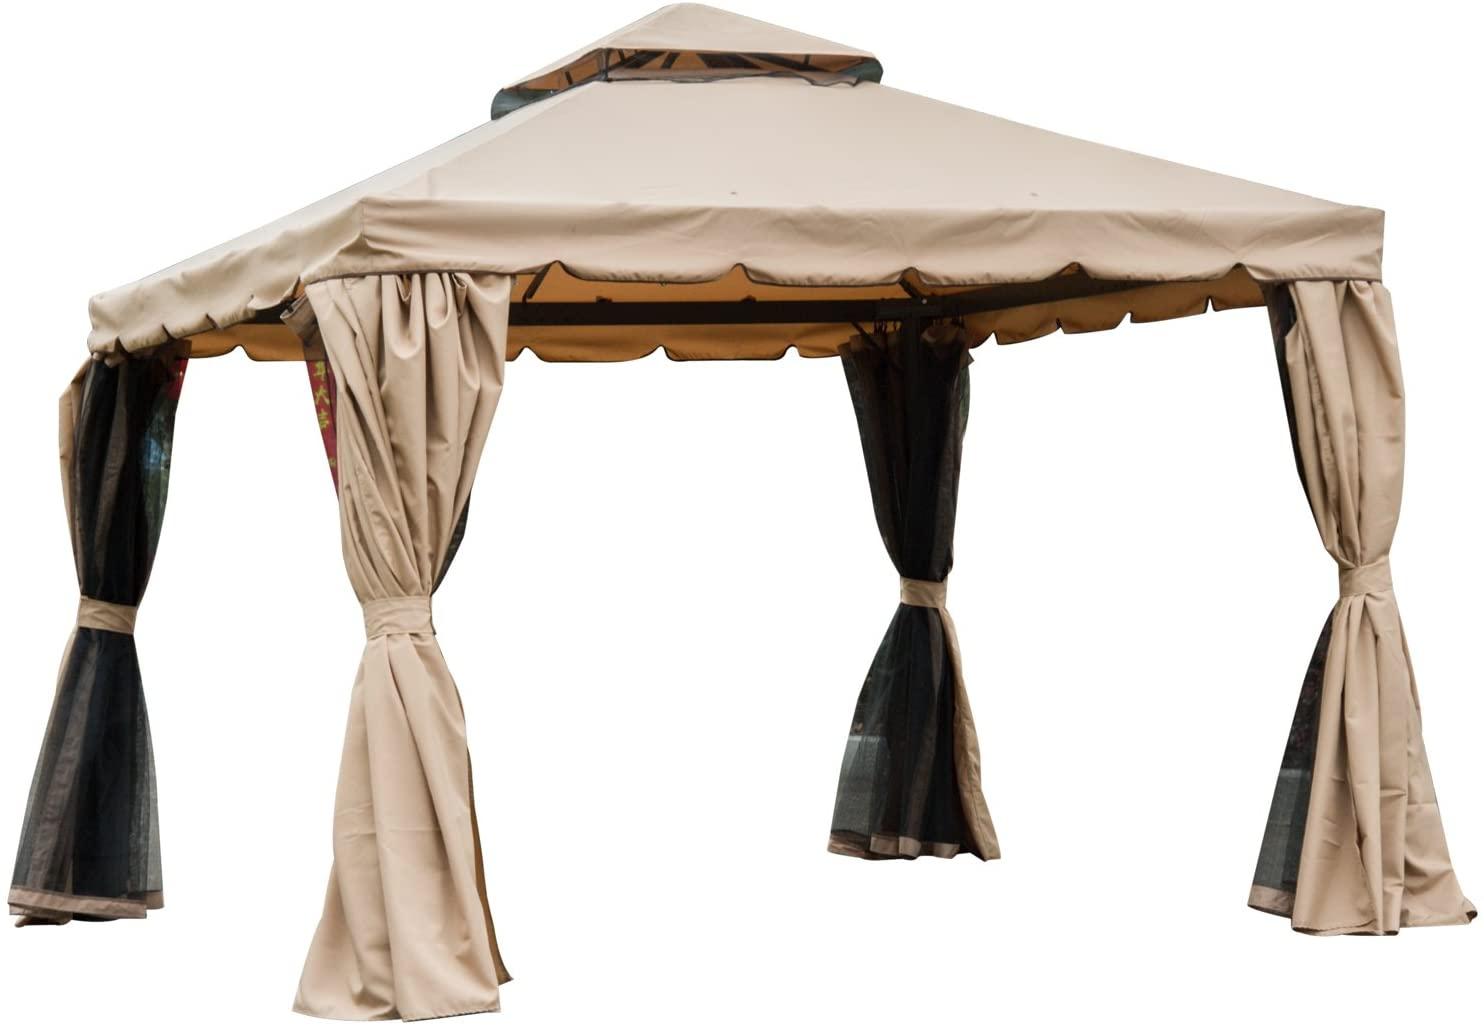 Outsunny Outdoor Gazebo Canopy